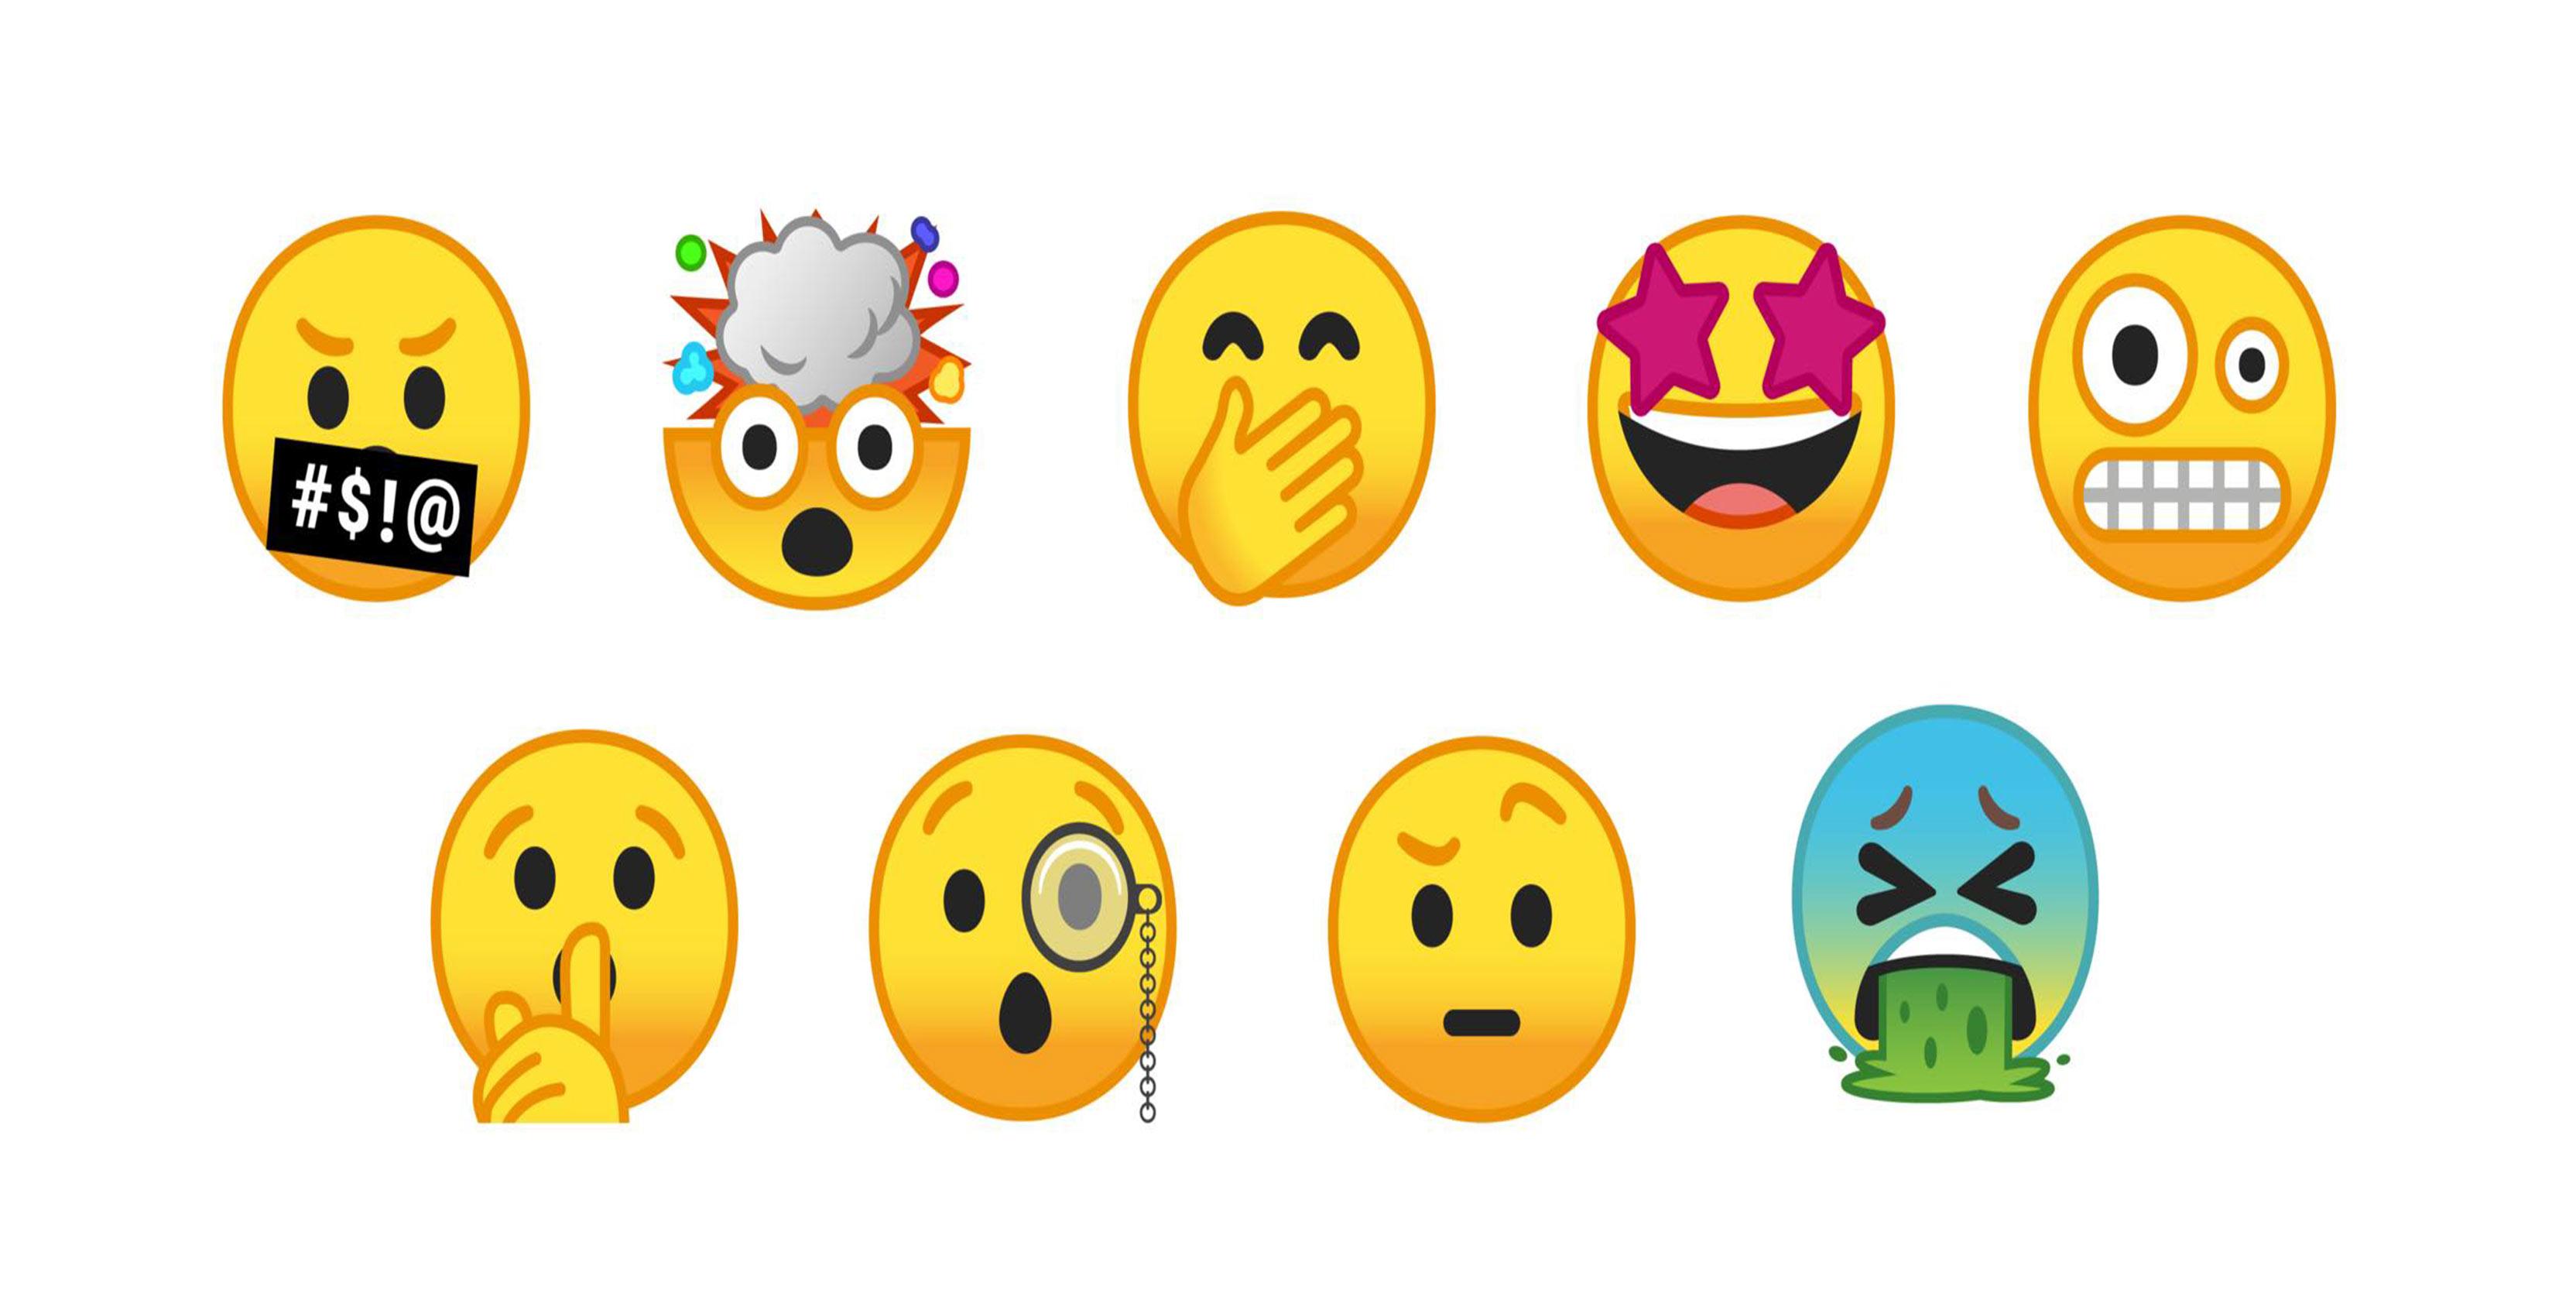 Android O Emoji